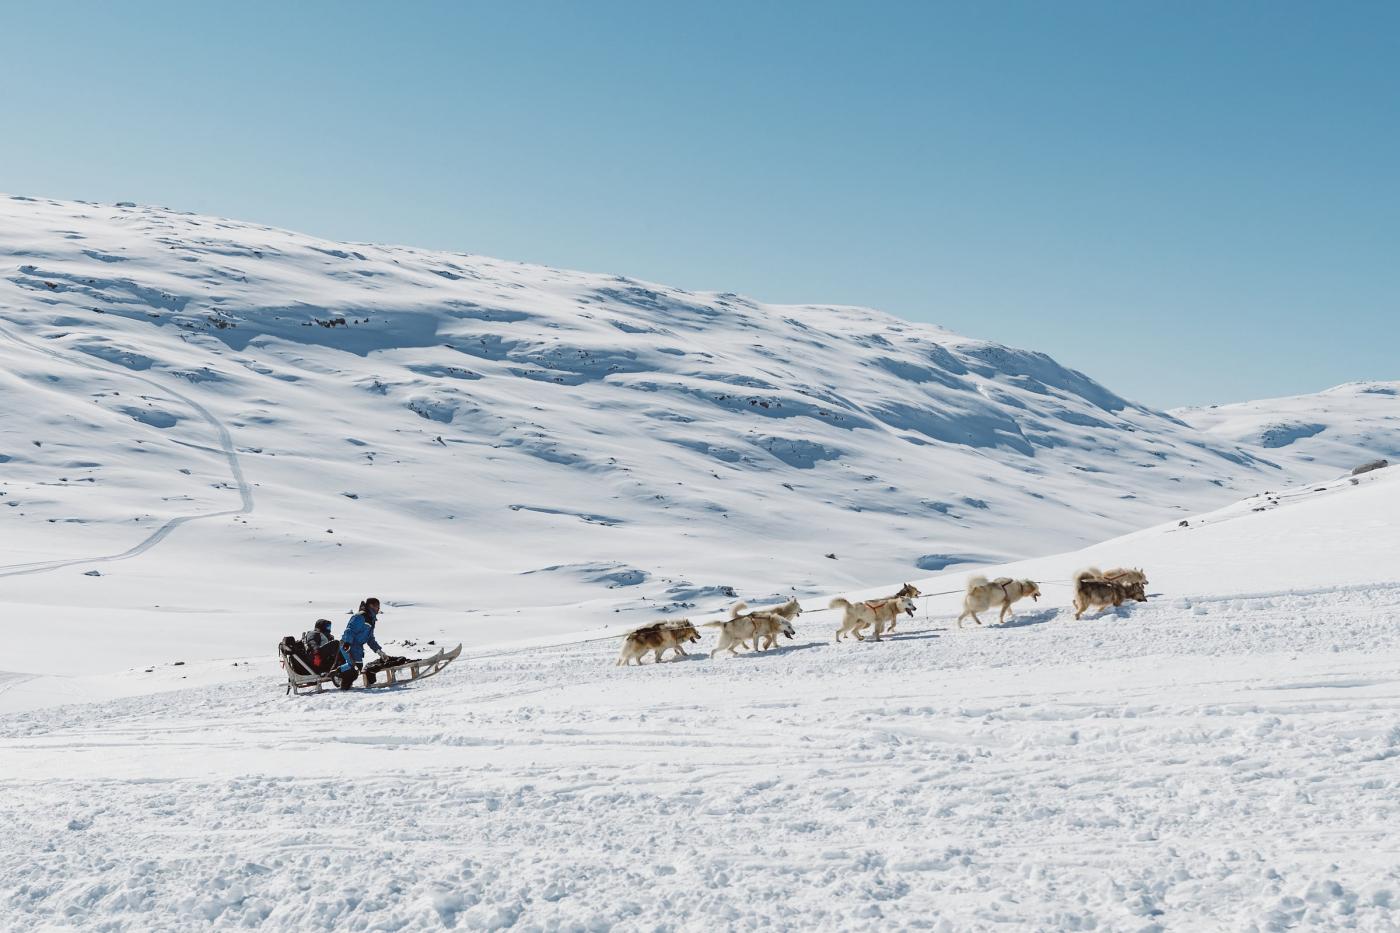 Dog sled on its way to Tasiilaq backcountry. Photo - Nikolaus Brinkmann, Visit Greenland